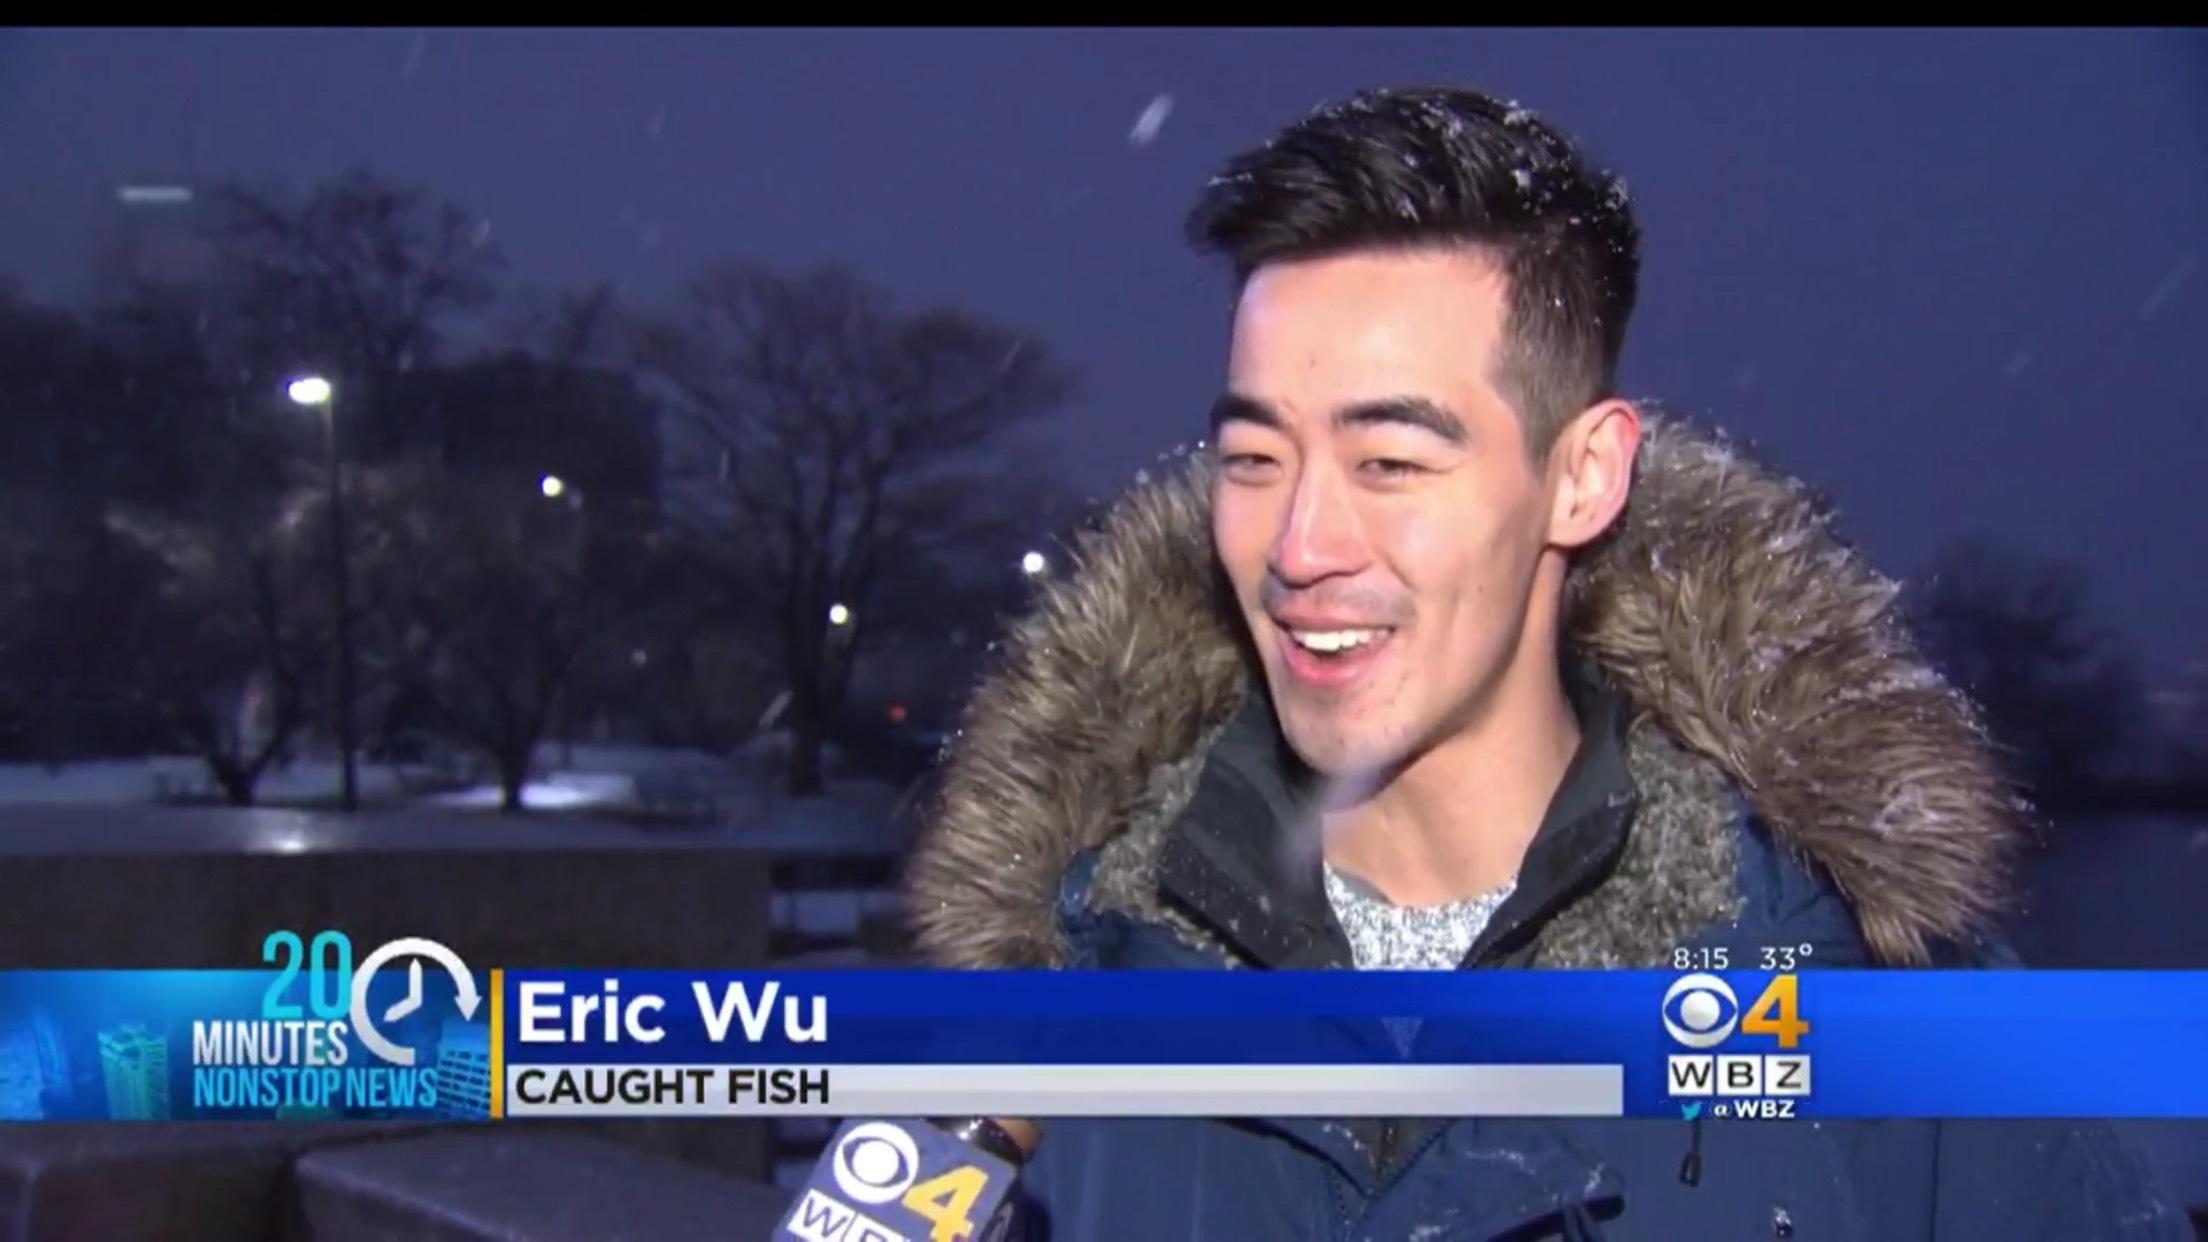 Eric Wu: Caught Fish